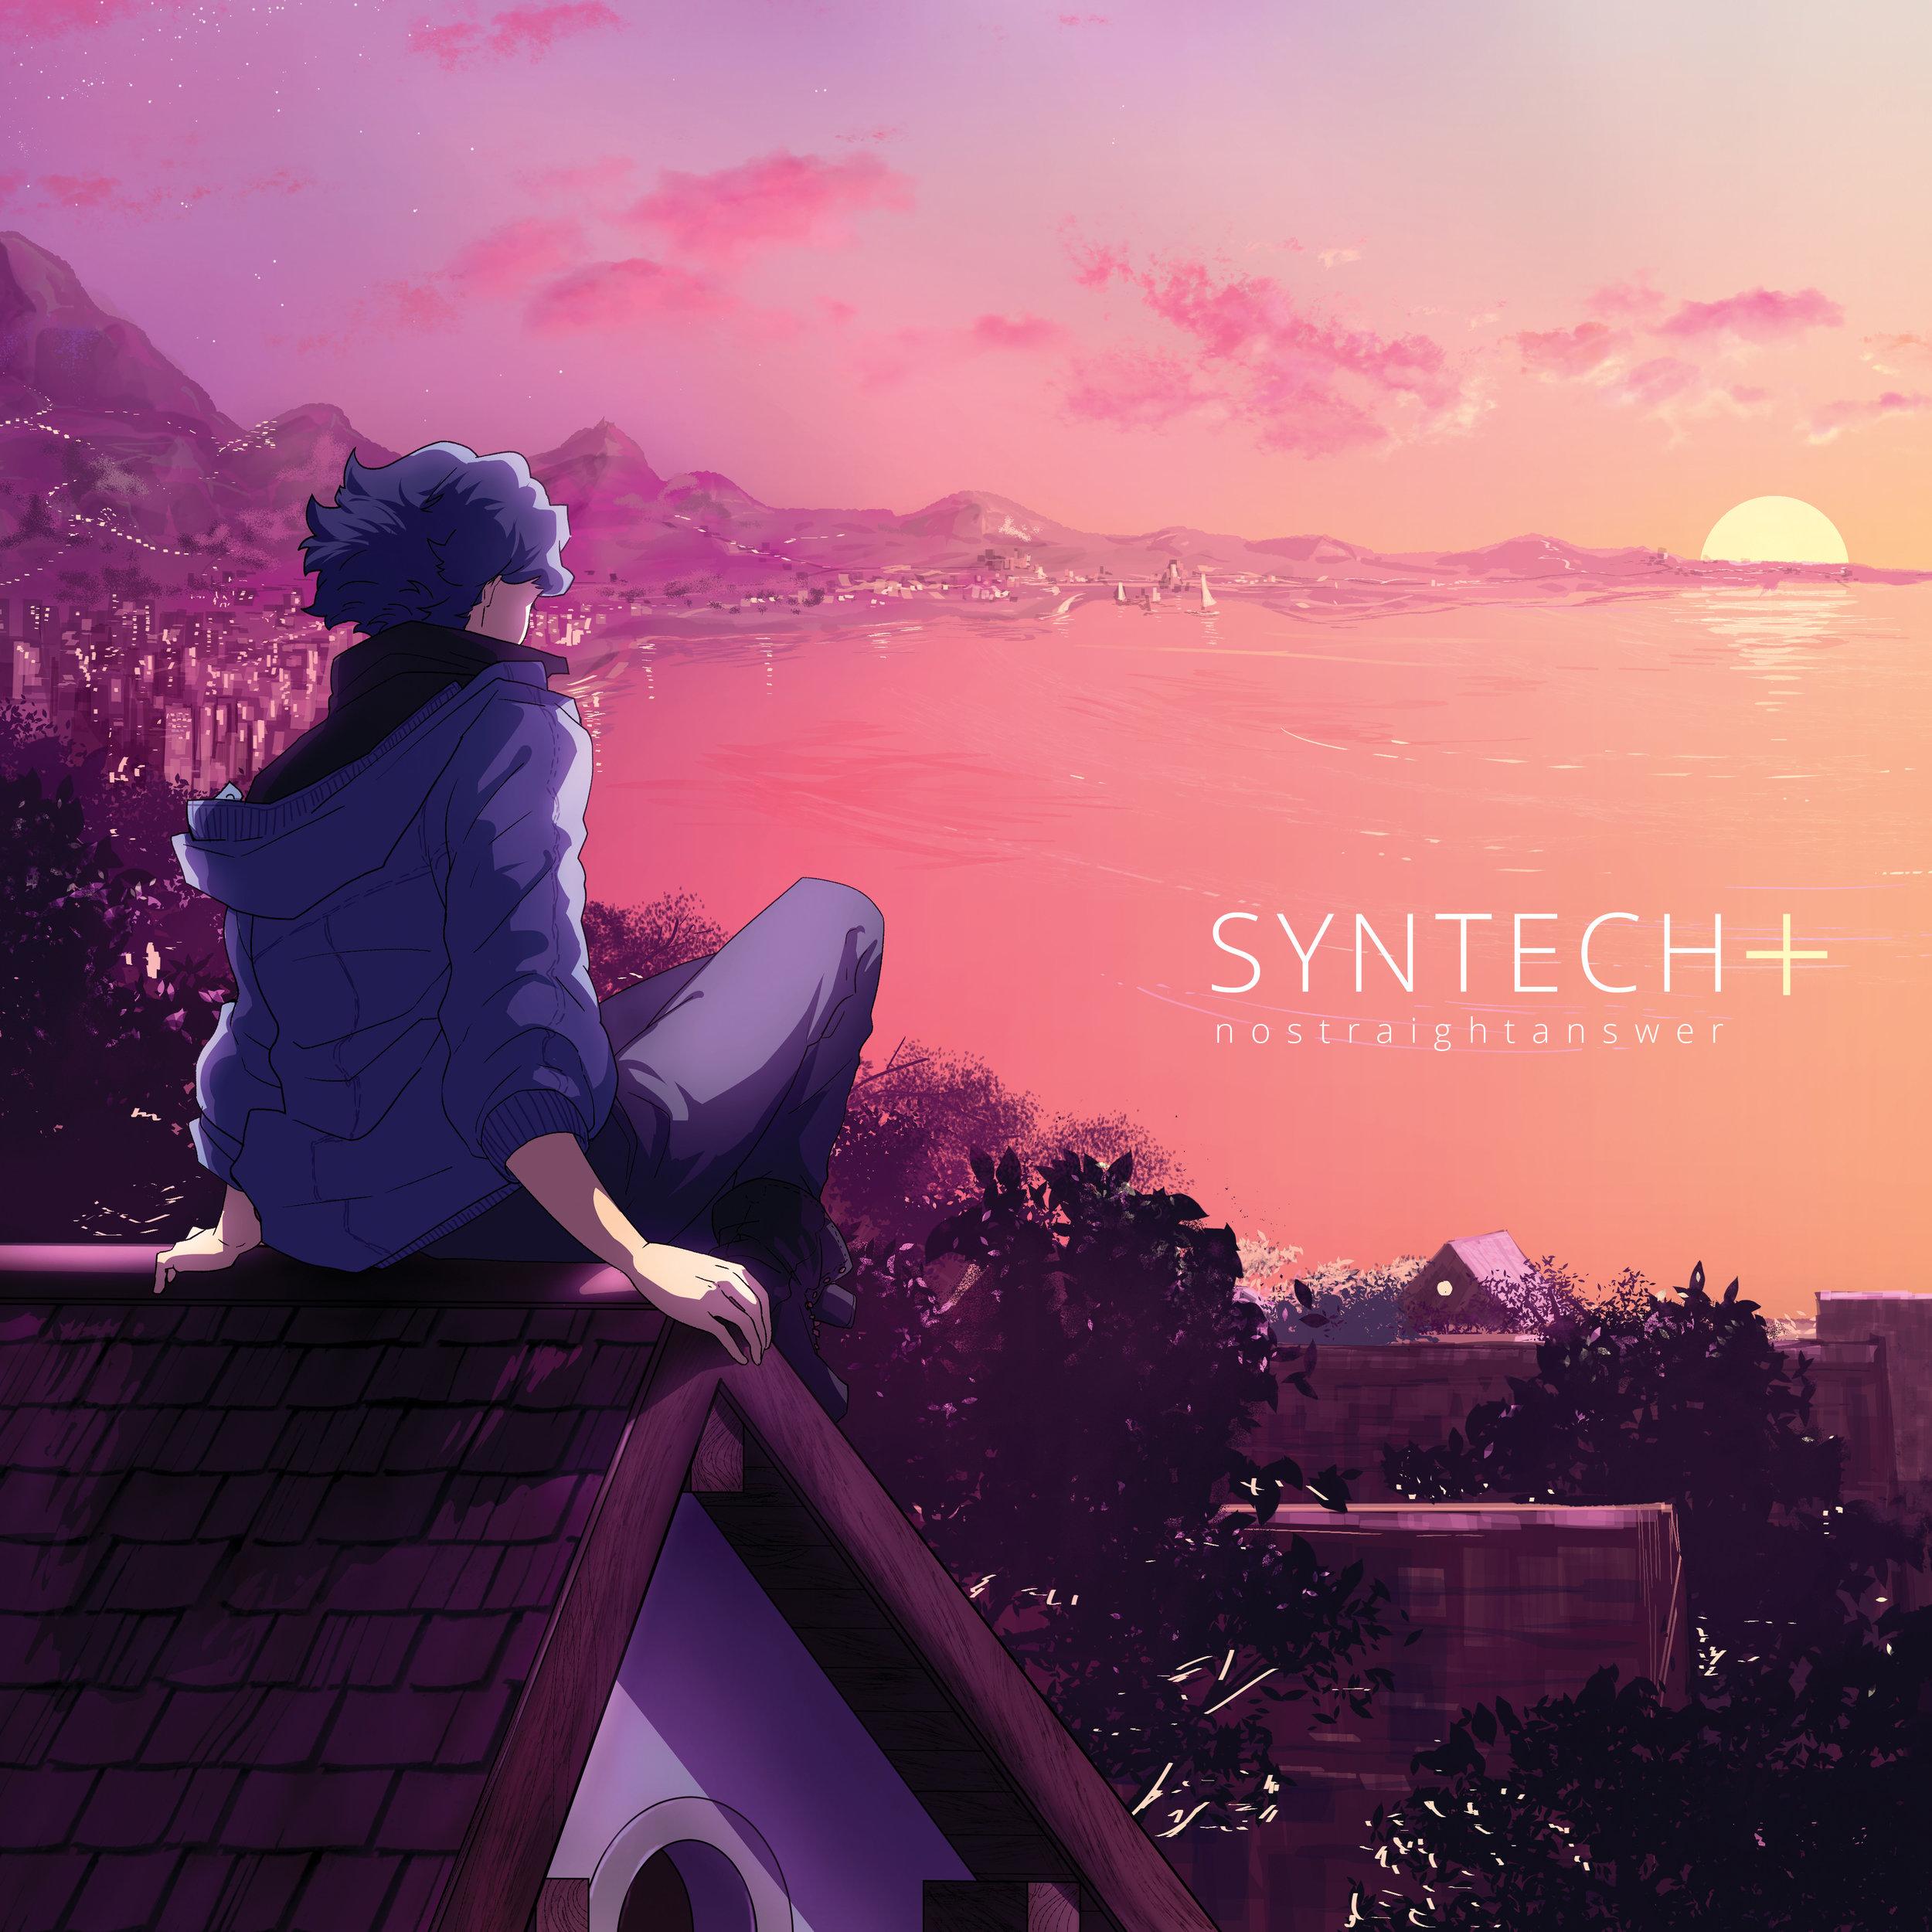 syntech_plus-art.jpg